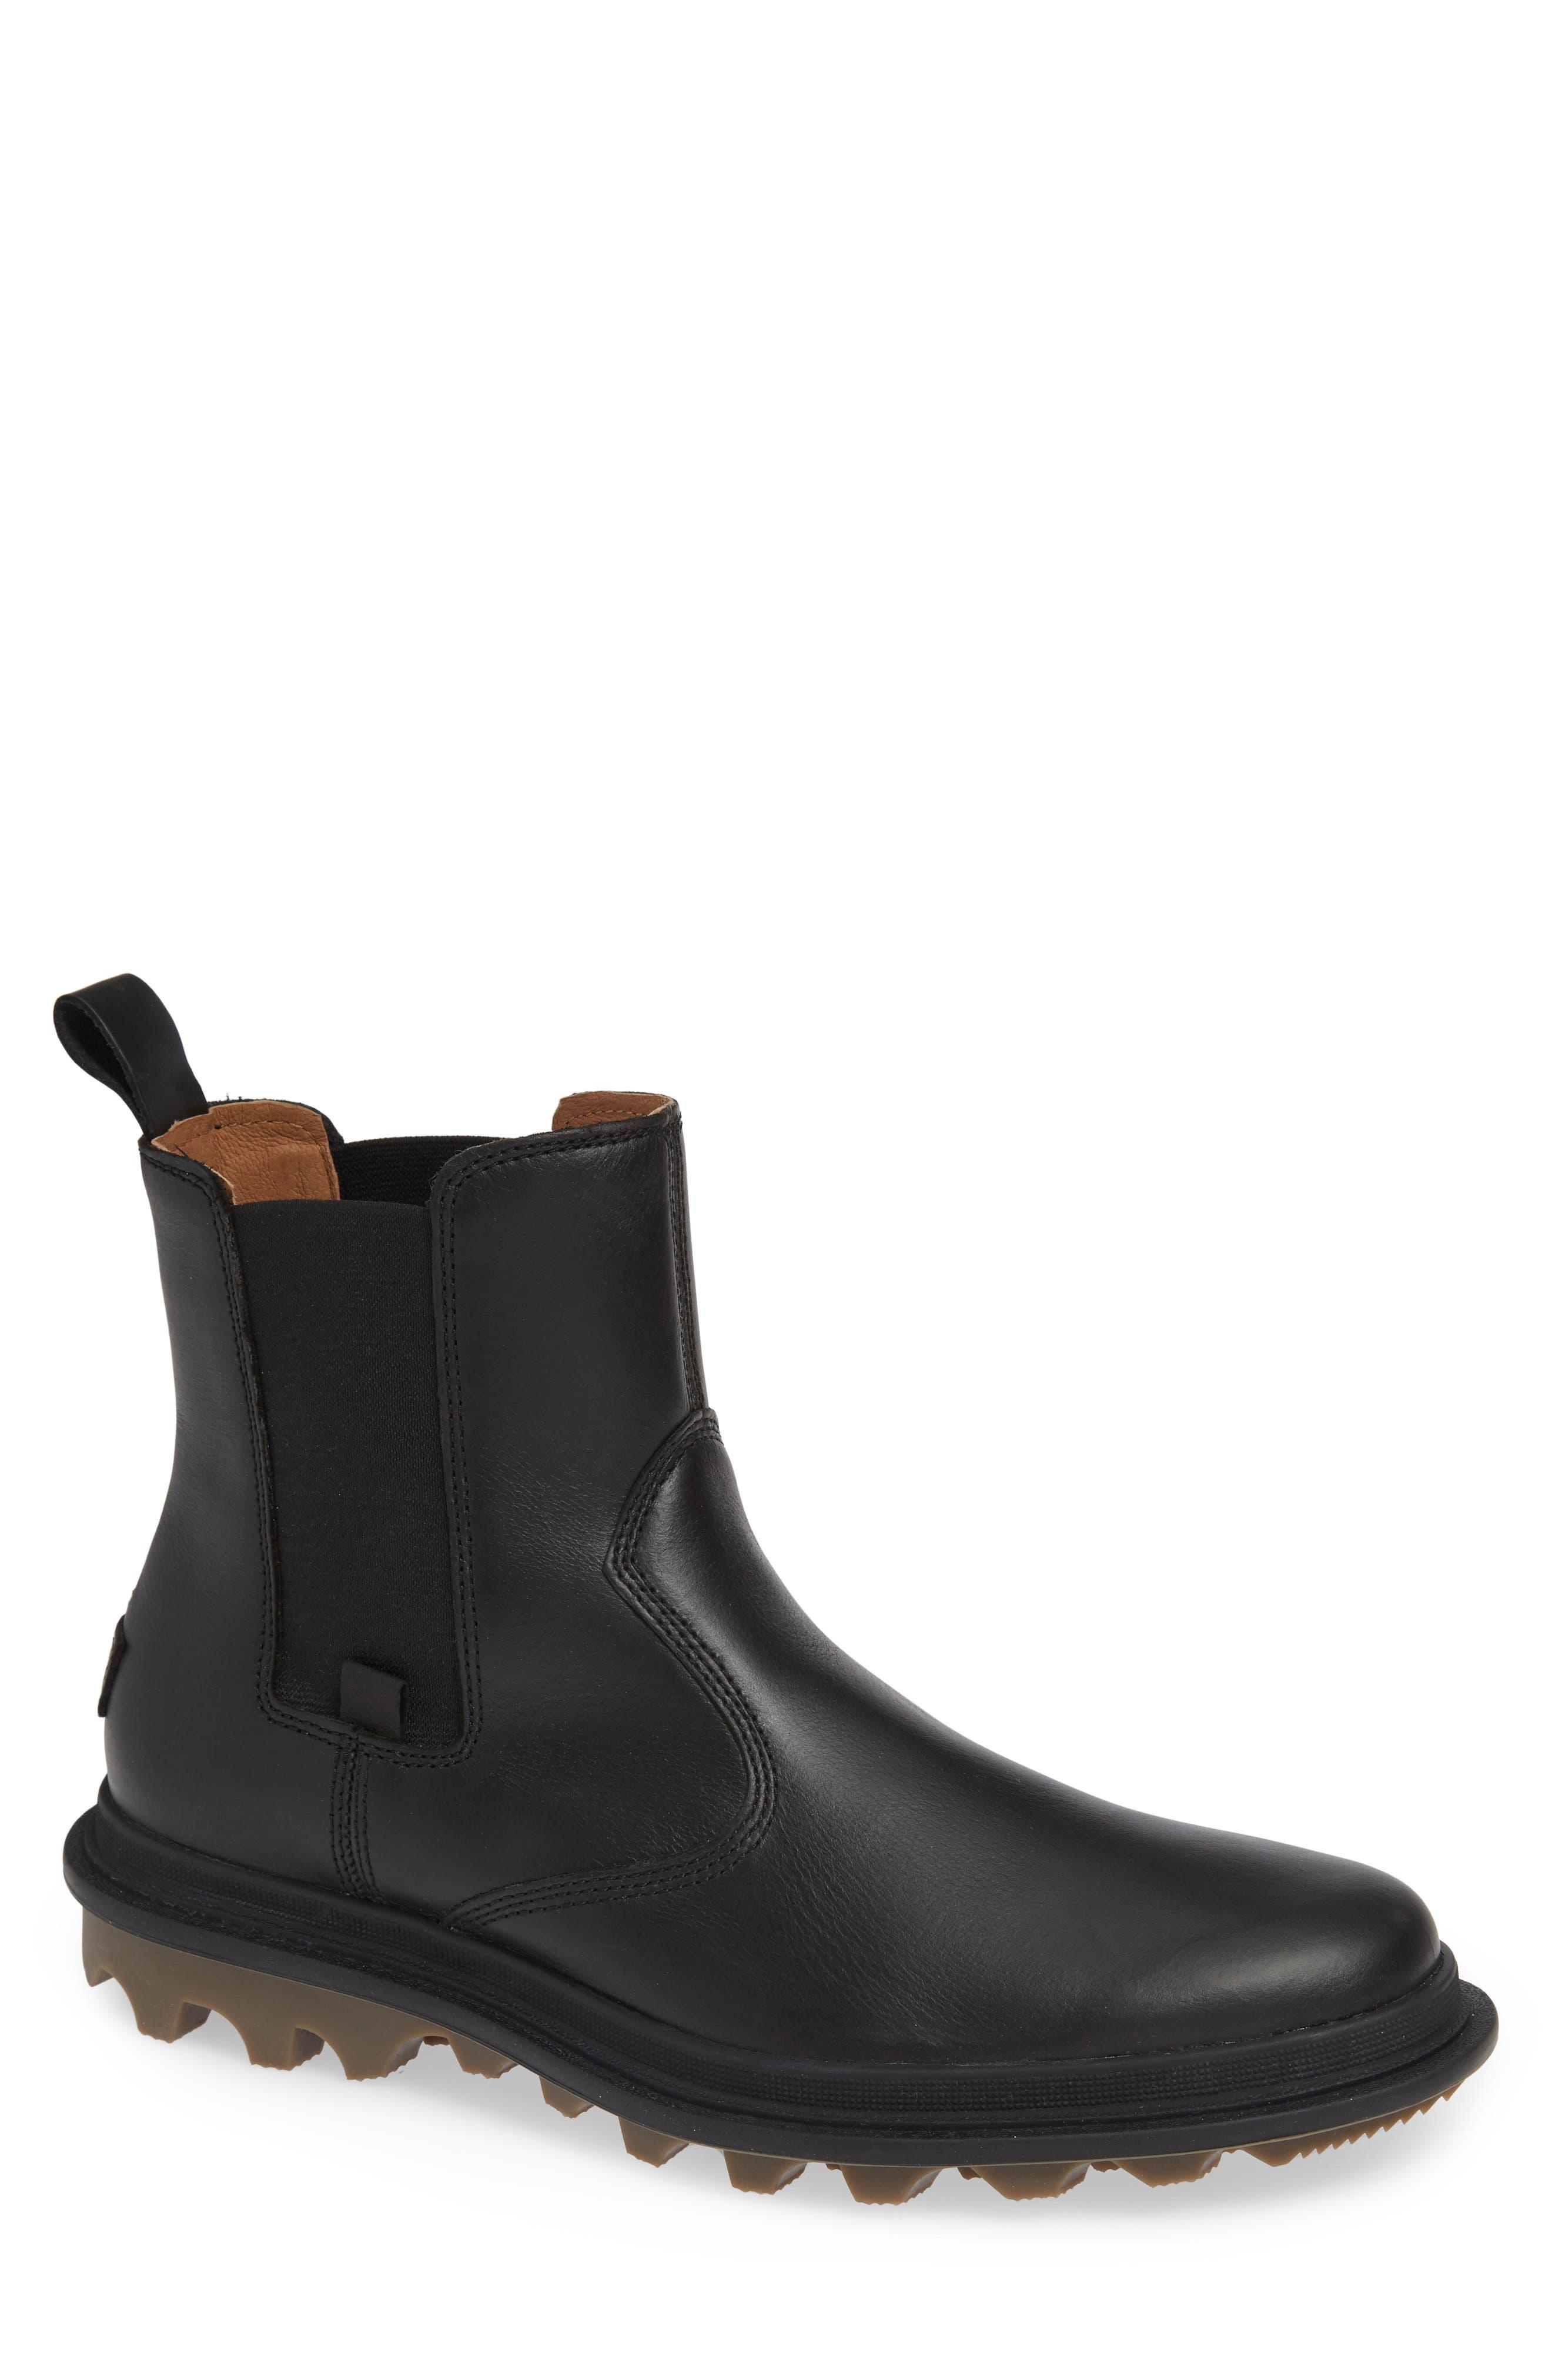 SOREL,                             Ace Waterproof Chelsea Boot,                             Main thumbnail 1, color,                             010